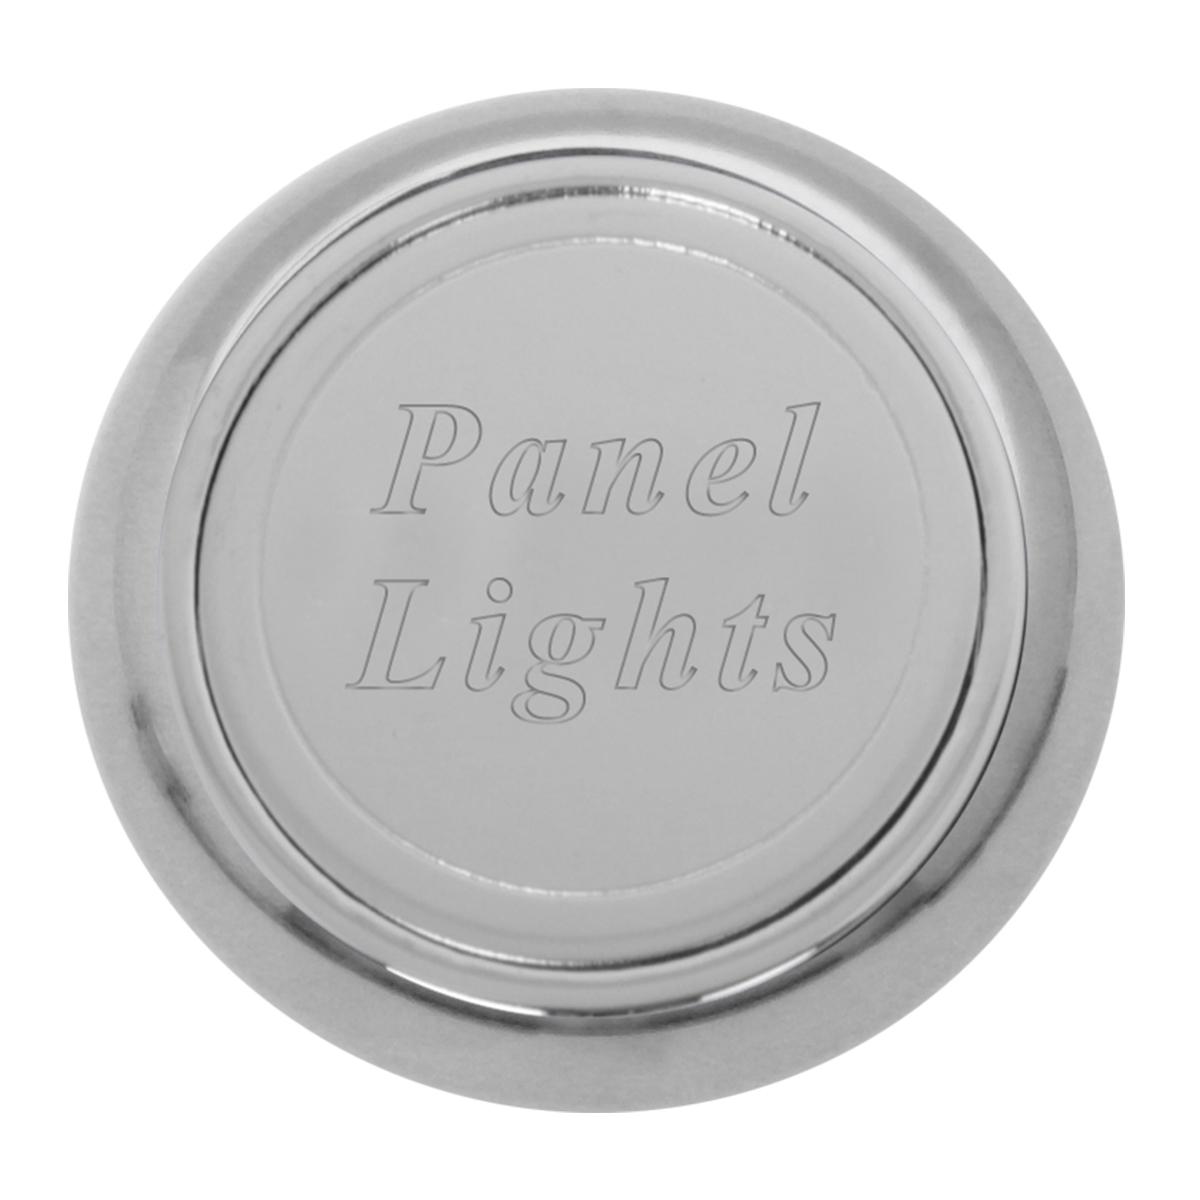 96056 Dashboard Control Knob w/ Panel Light Script